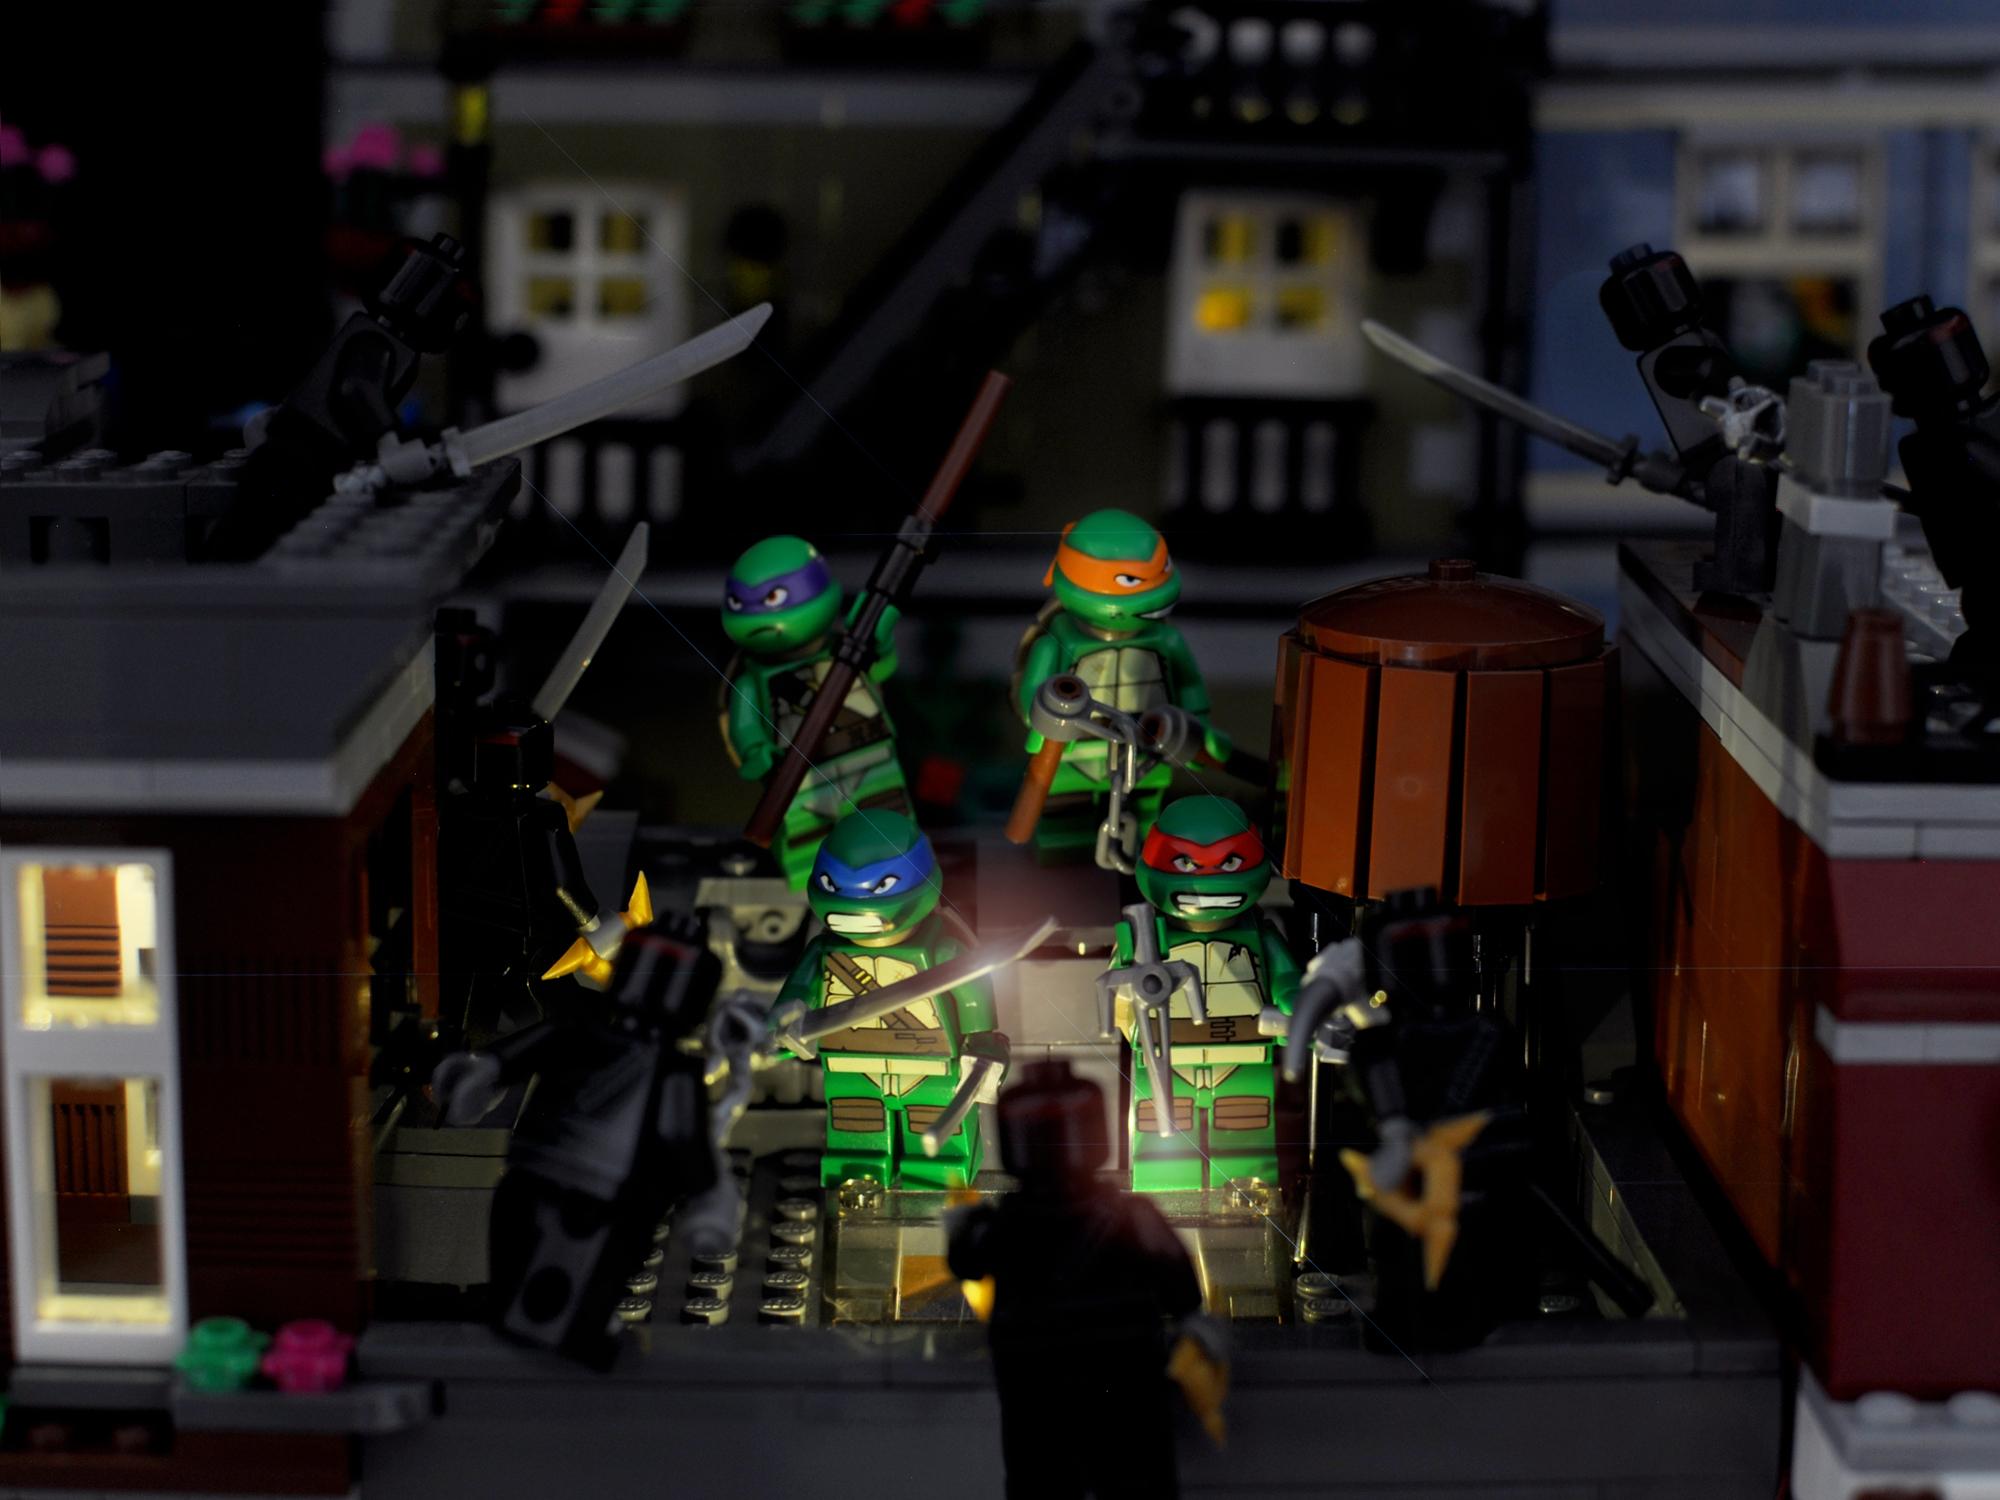 Cowabunga! Teenage Mutant Ninja Turtles in Lego